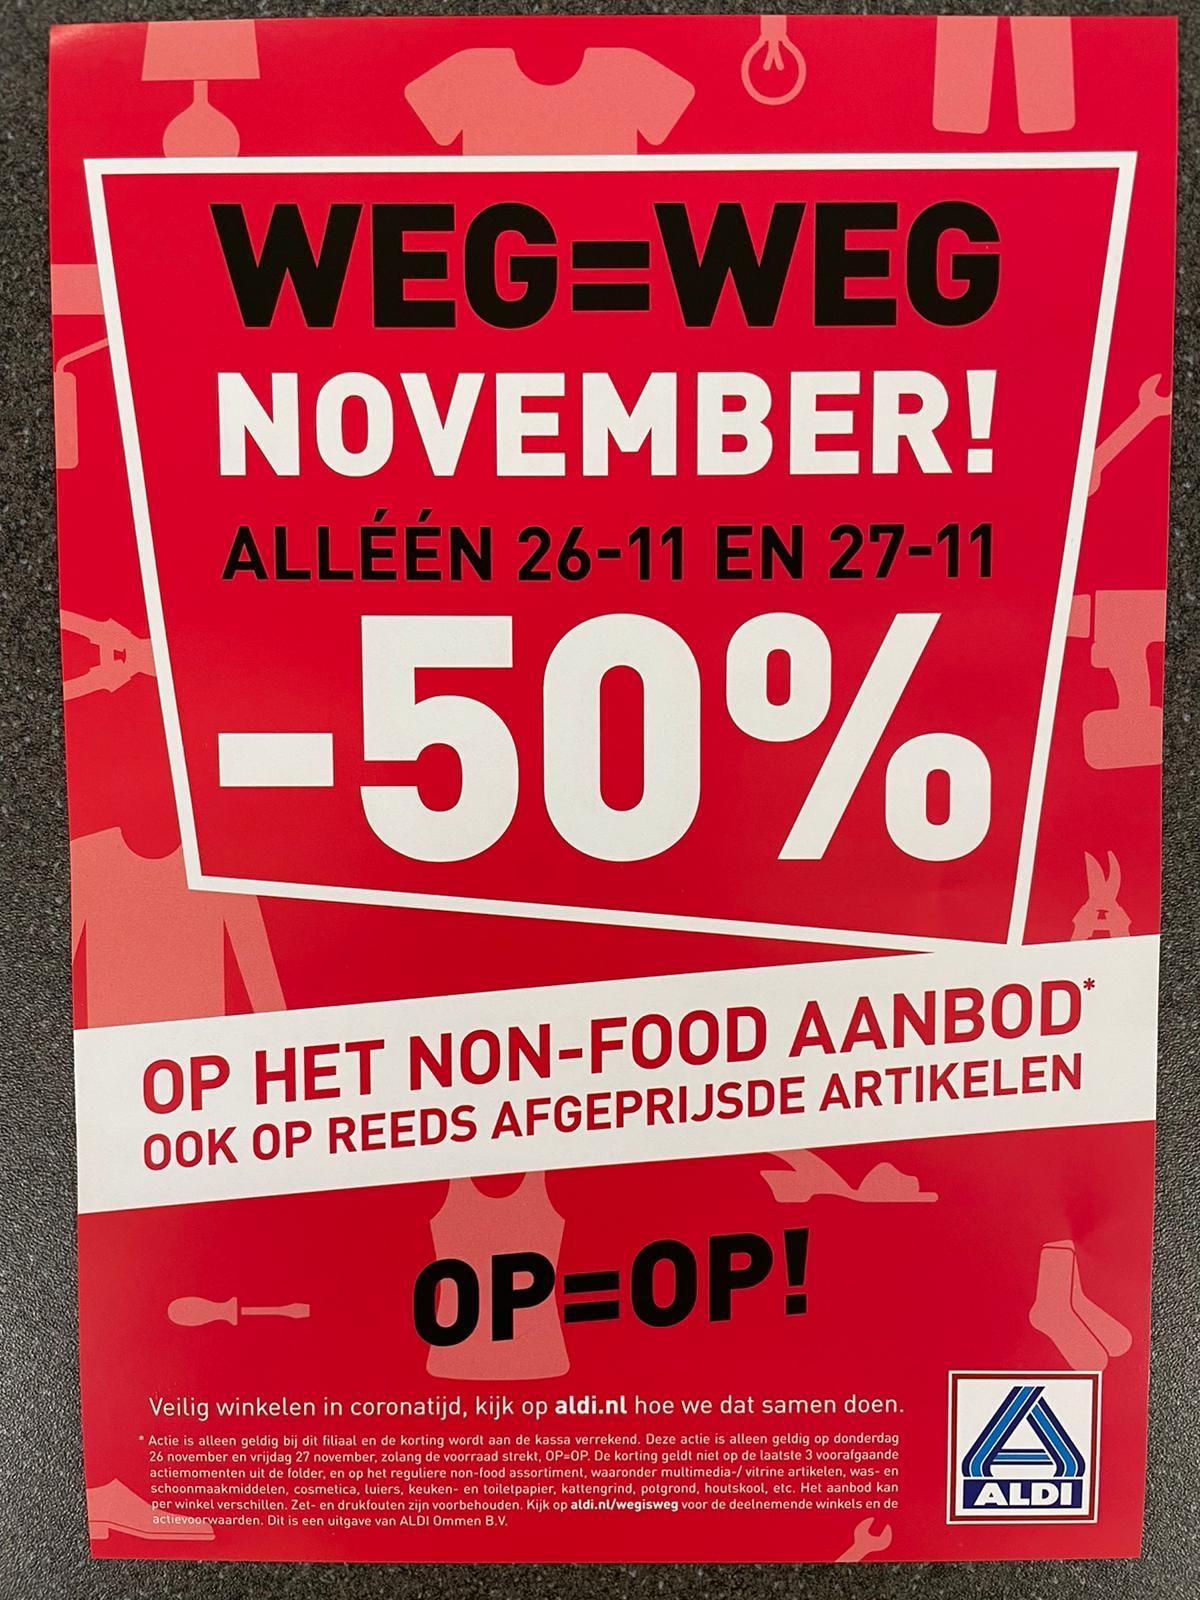 (Oost-Nederland) Aldi 50% korting op non food